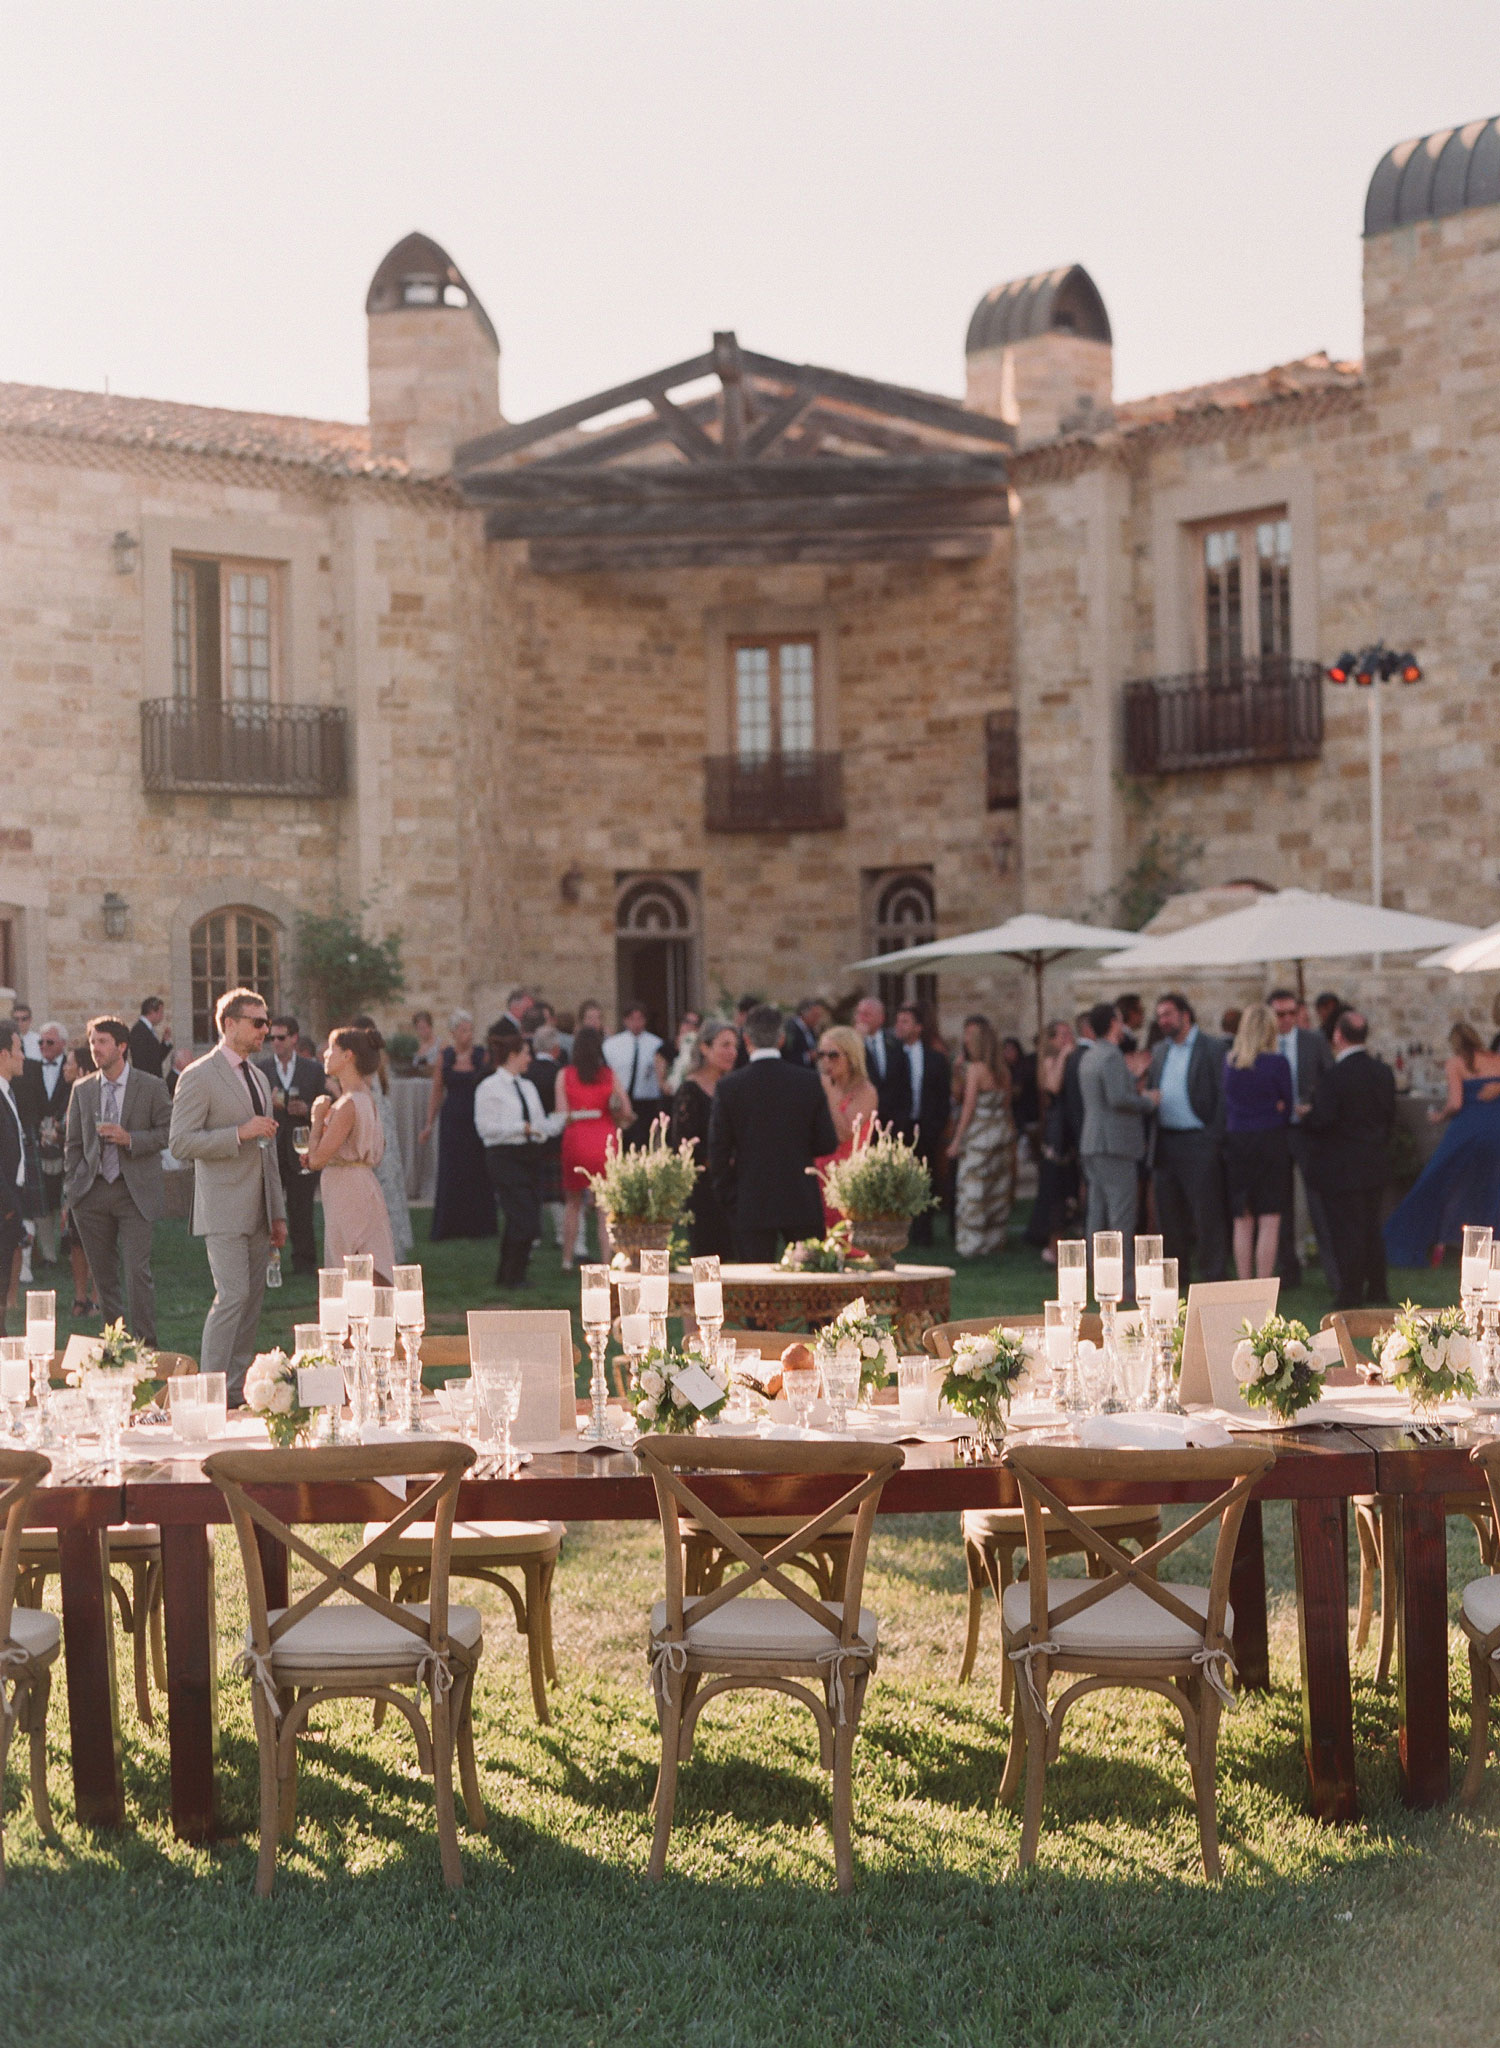 outdoor wedding reception winery in northern california mark paul gosselaar 2019 popular real weddings